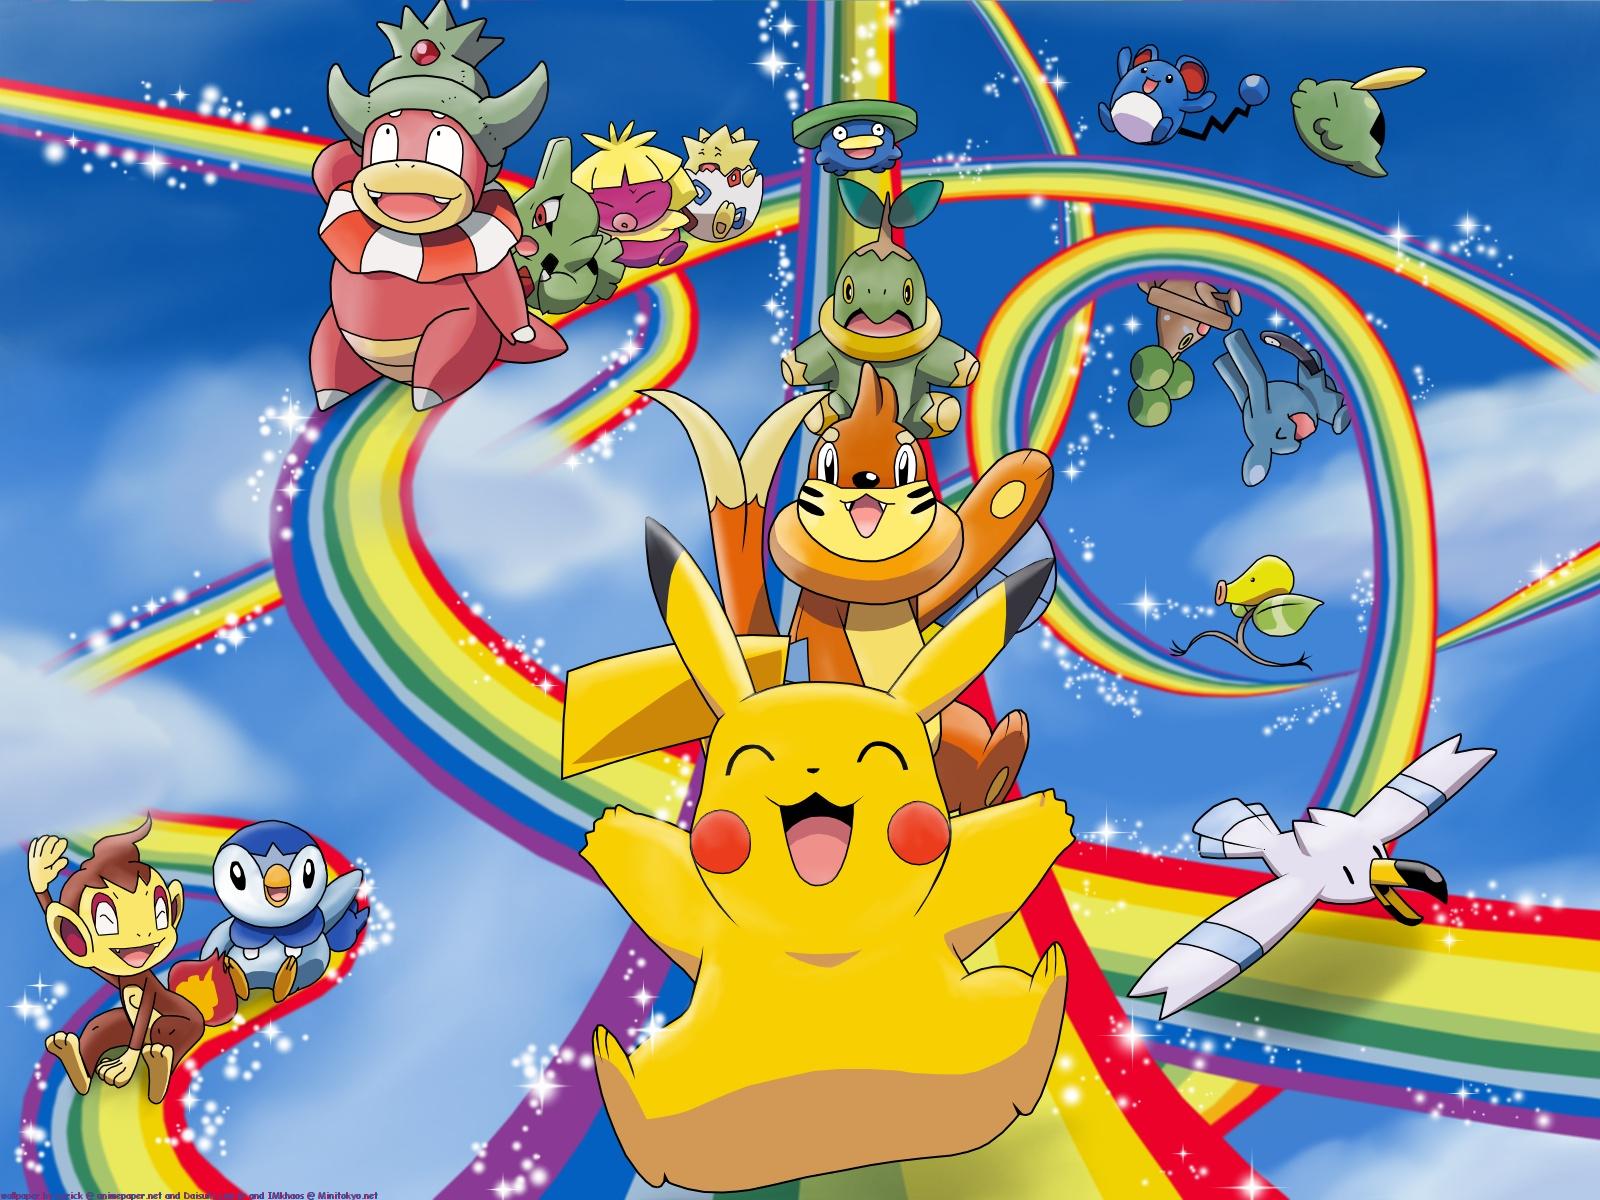 http://1.bp.blogspot.com/--4Y8Lc_EOX8/TeK2qPJ822I/AAAAAAAAAUc/Gs2-prvQmc8/s1600/Pokemon-Wallpapers-030.jpg